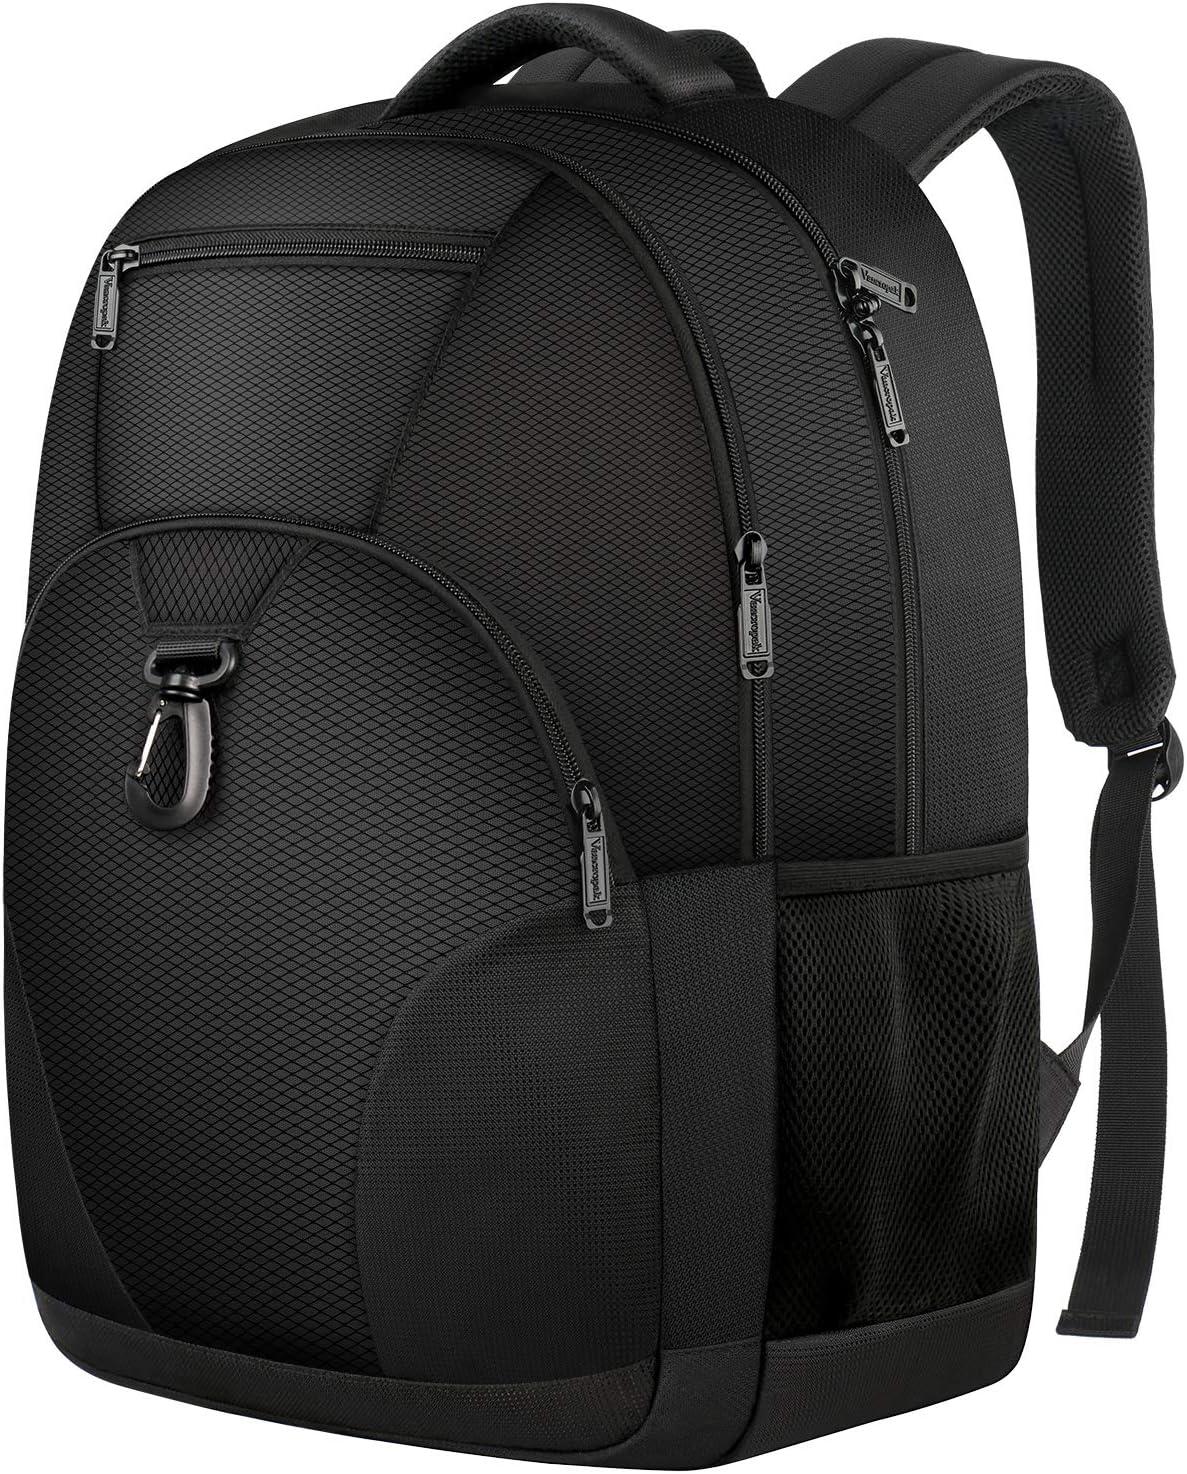 Sports Backpack Large Rucksack Baseball Print Boys Student School Bag Laptop